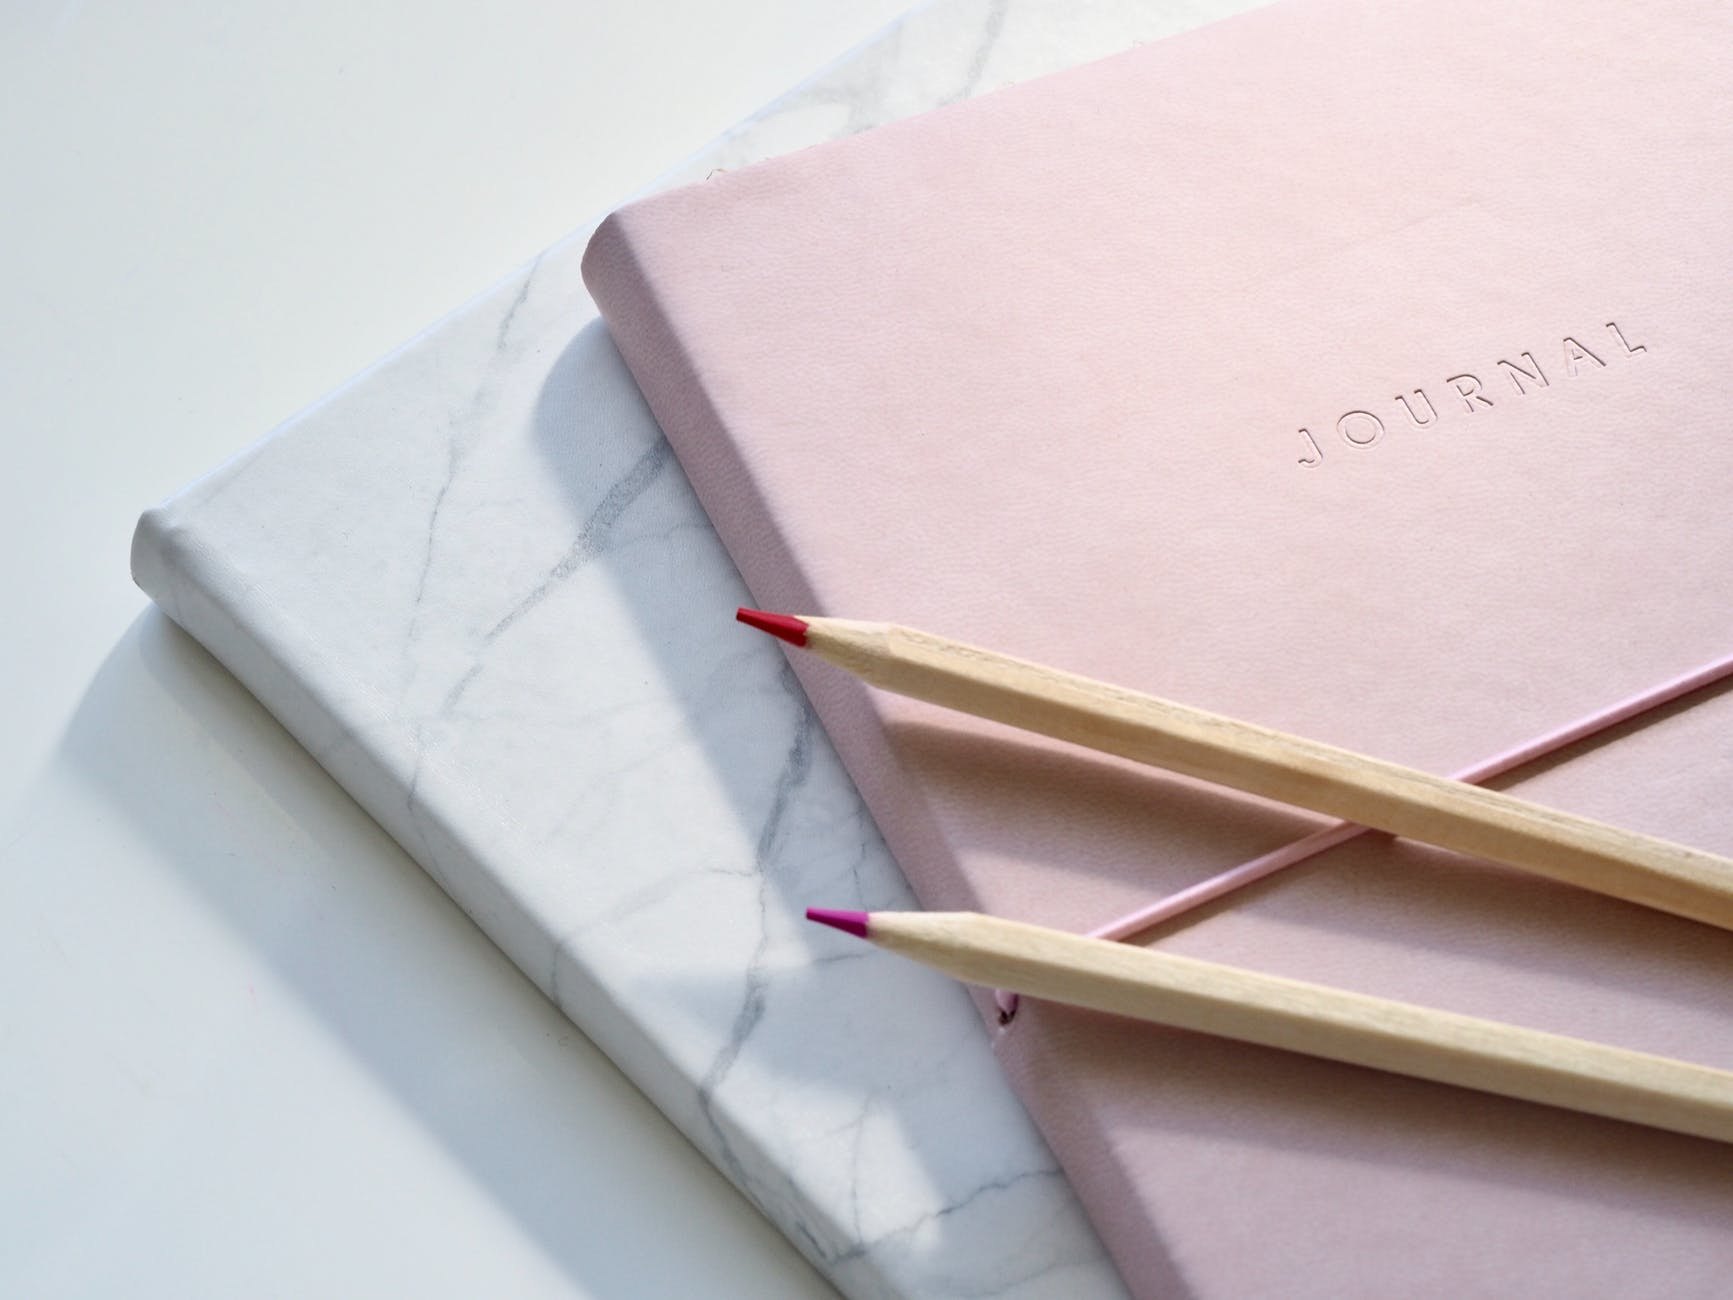 Journaling has great benefits